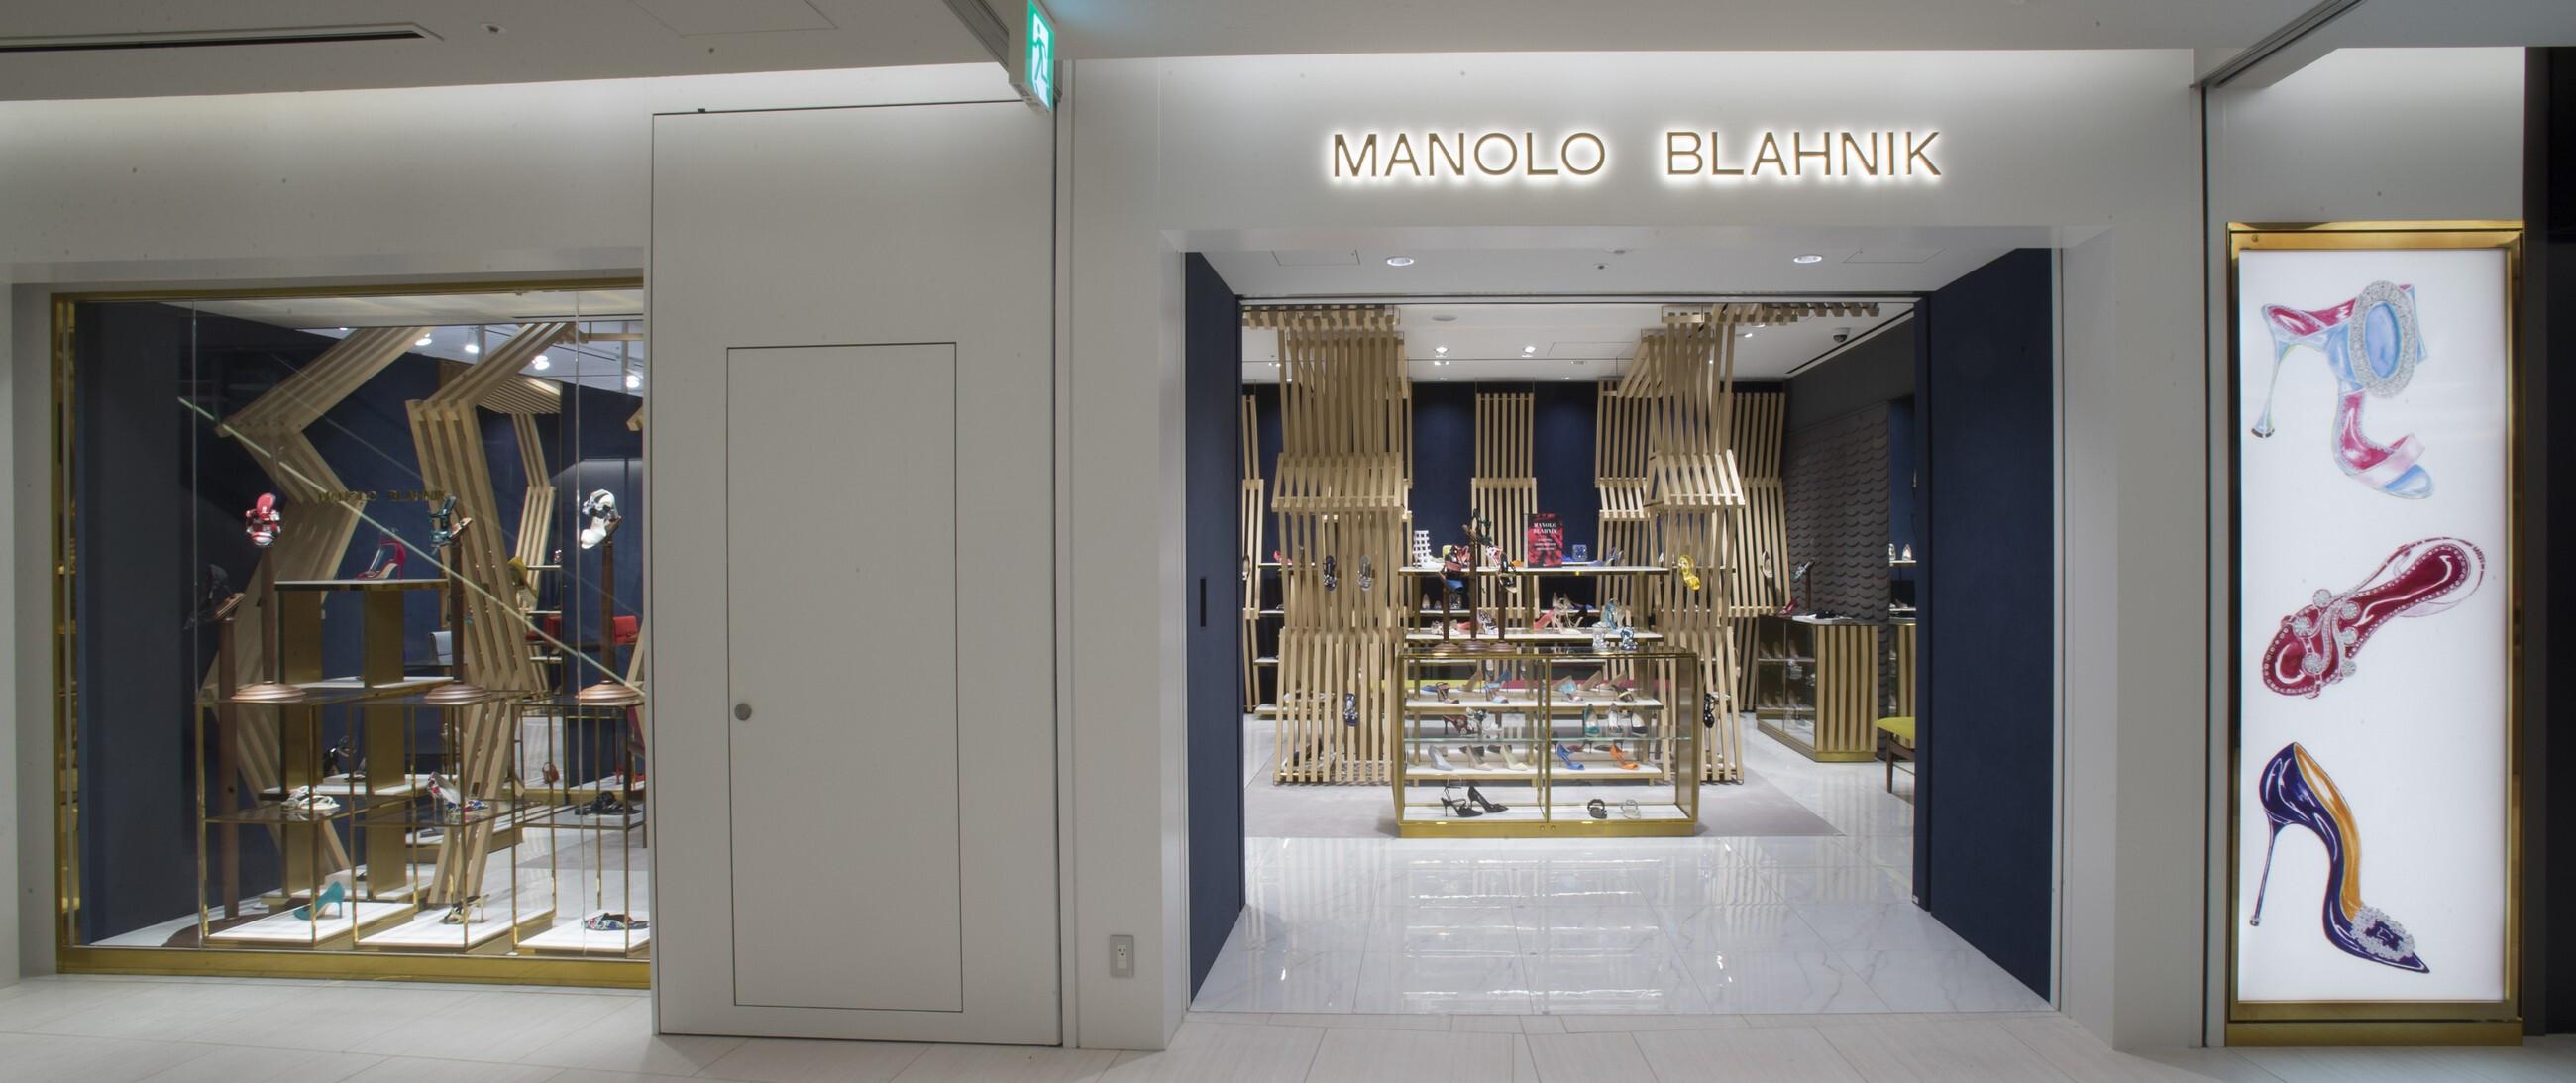 Manolo Blahnik Japan